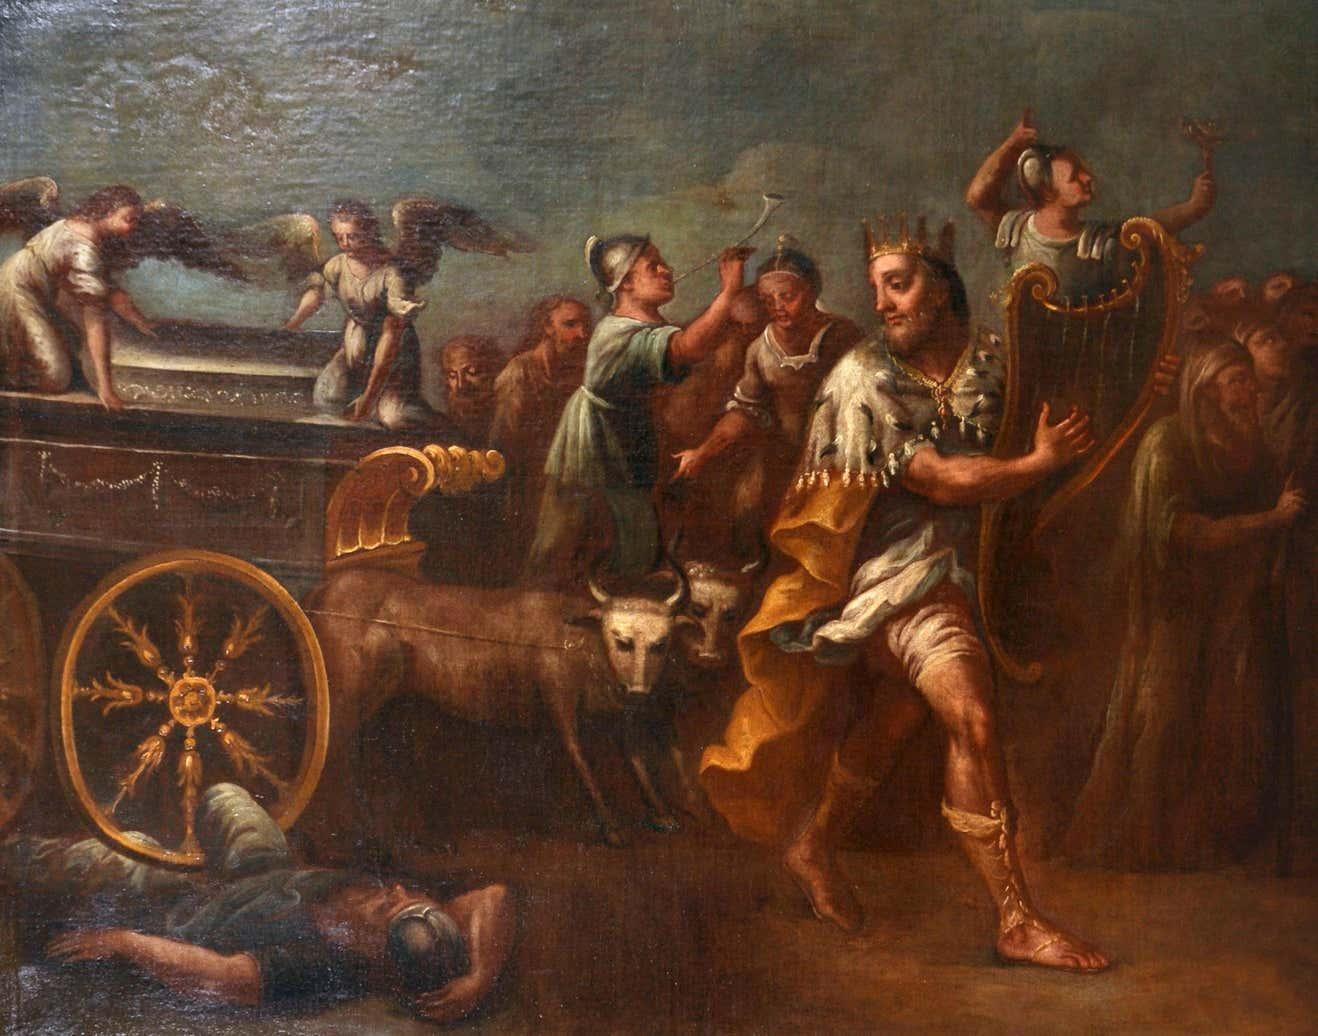 Uzzah and the Ark